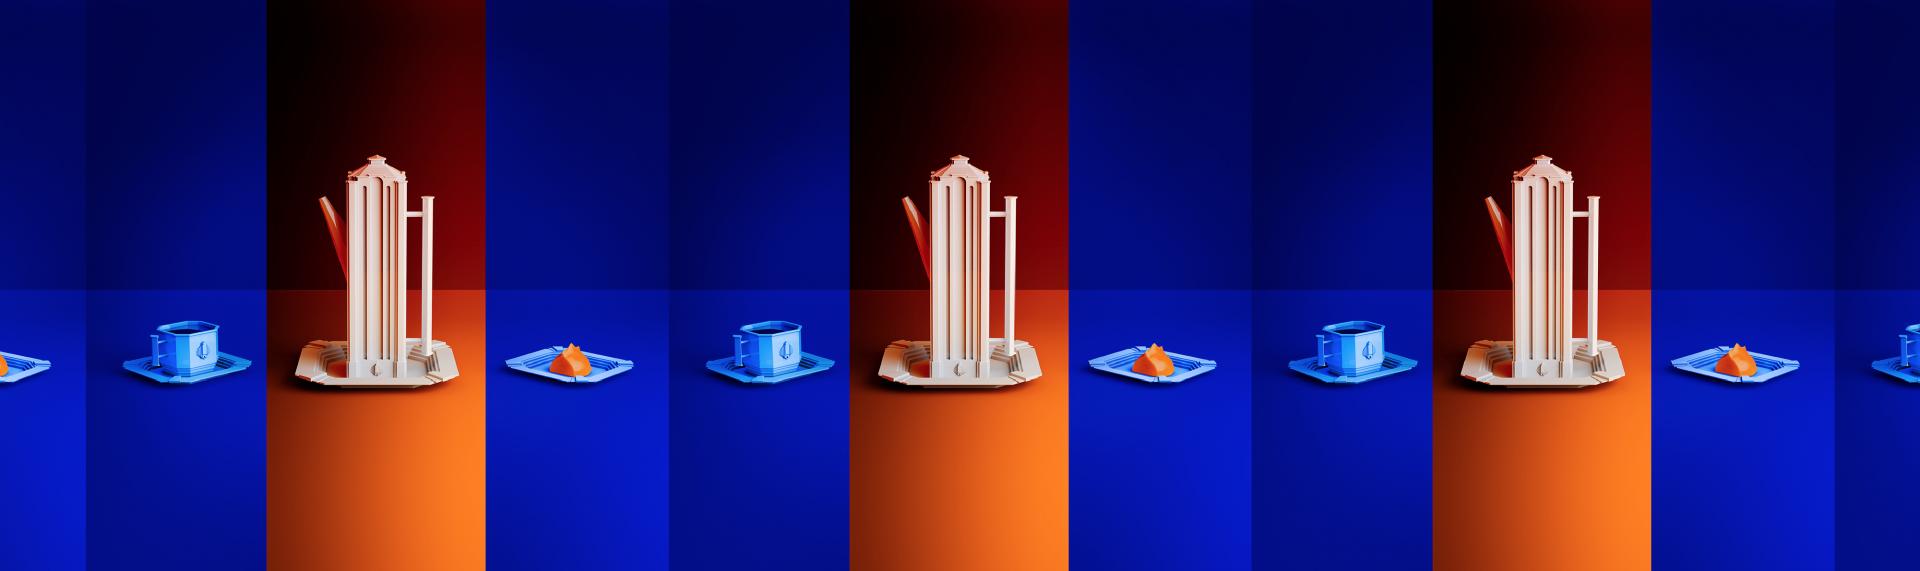 3D-інтерпретації каунаської модерністської архітектури